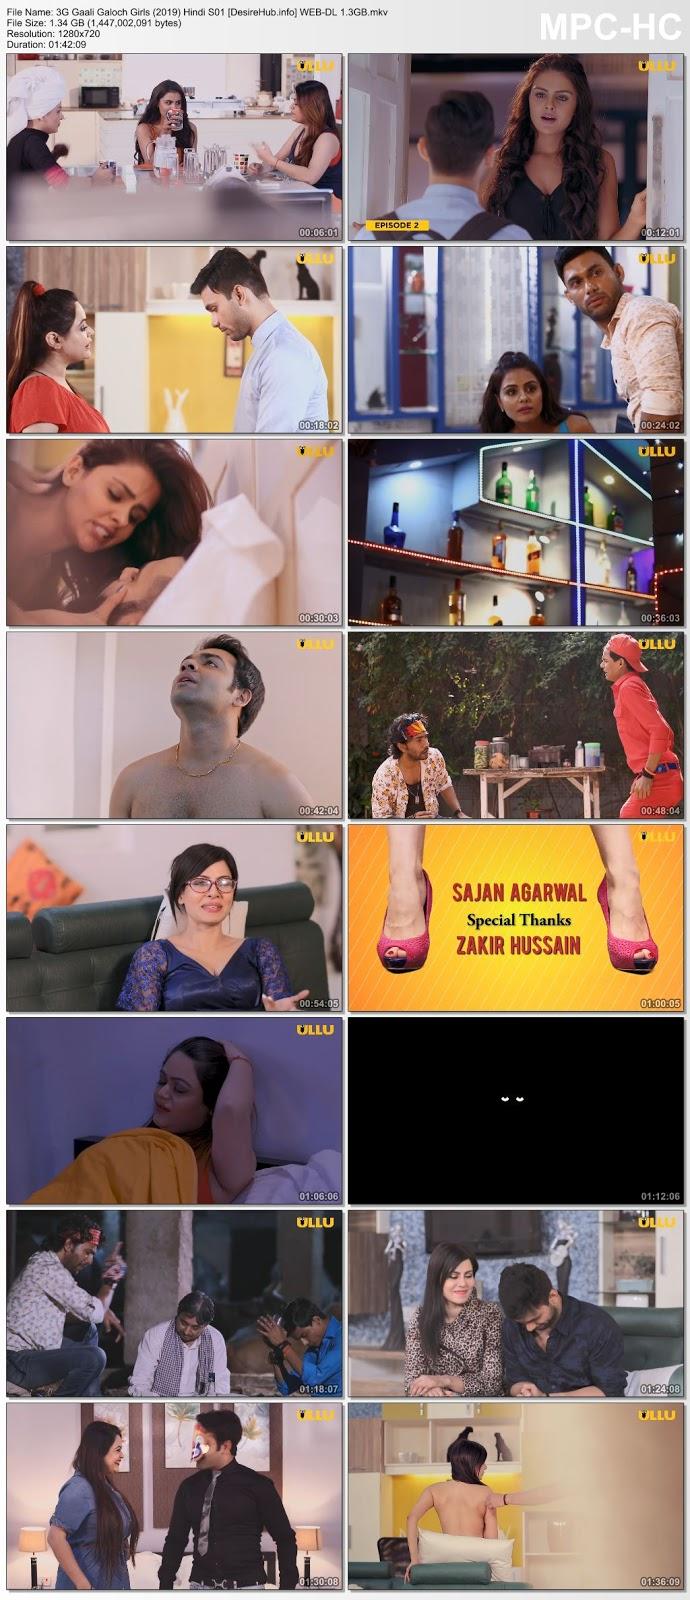 3G Gaali Galoch Girls (2019) Complete S01 Hindi 480p WEB-DL 300MB Desirehub